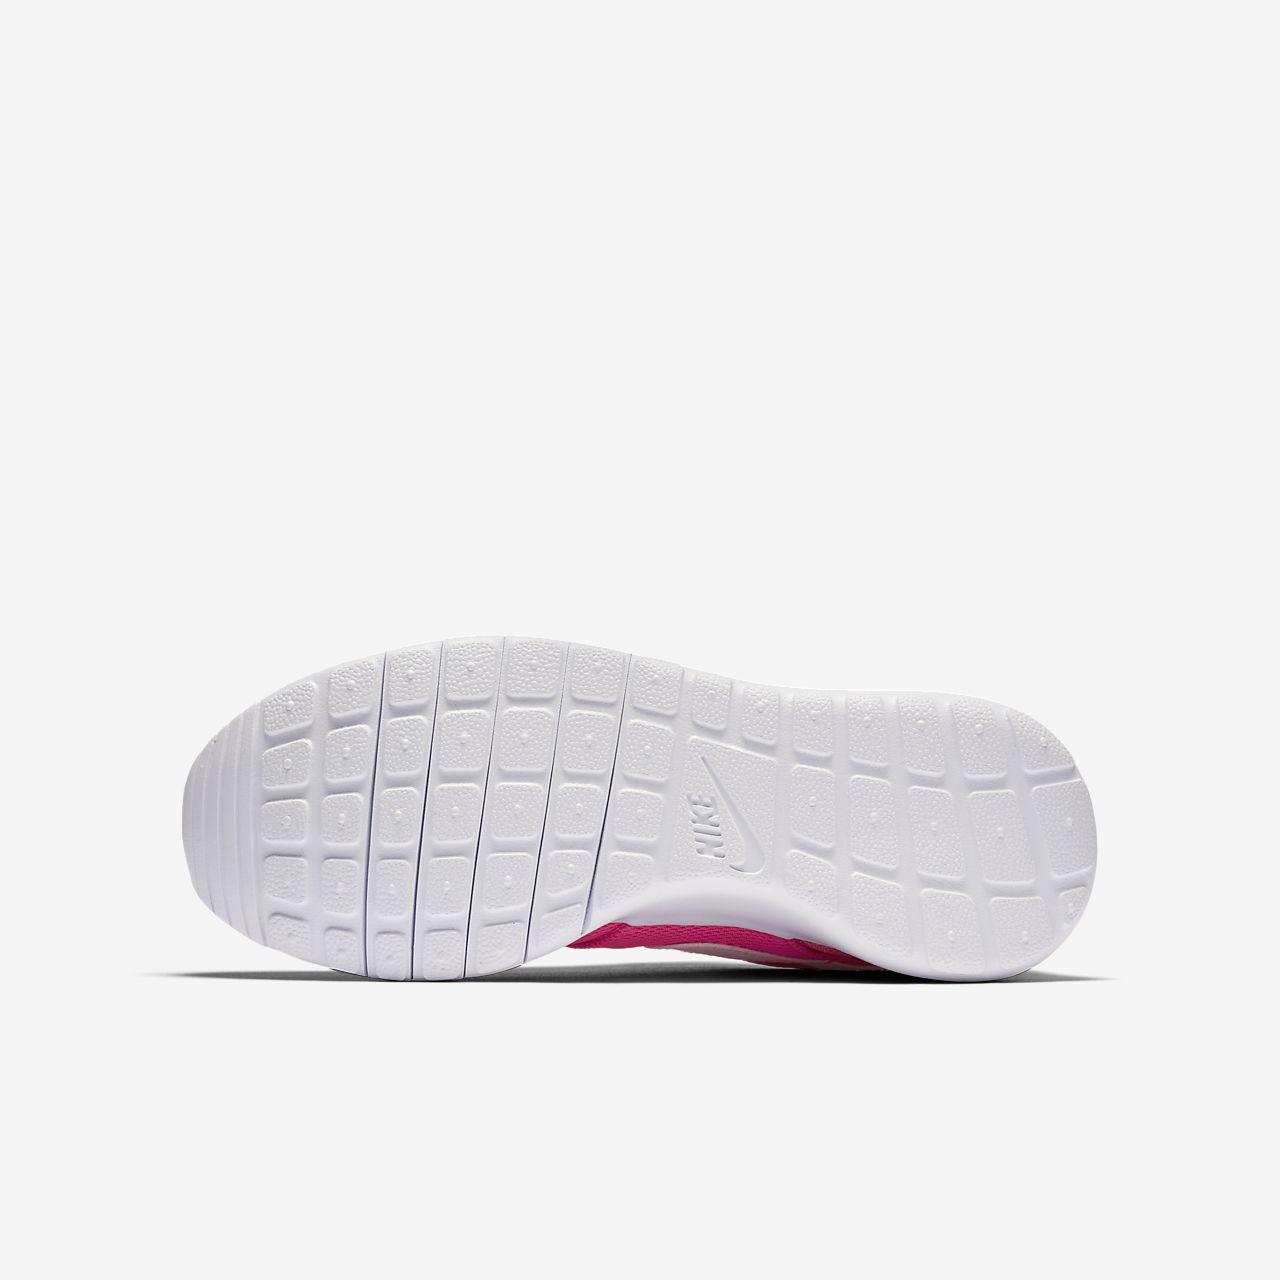 ef4944c575f92 Nike Roshe One Older Kids  Shoe. Nike.com NZ